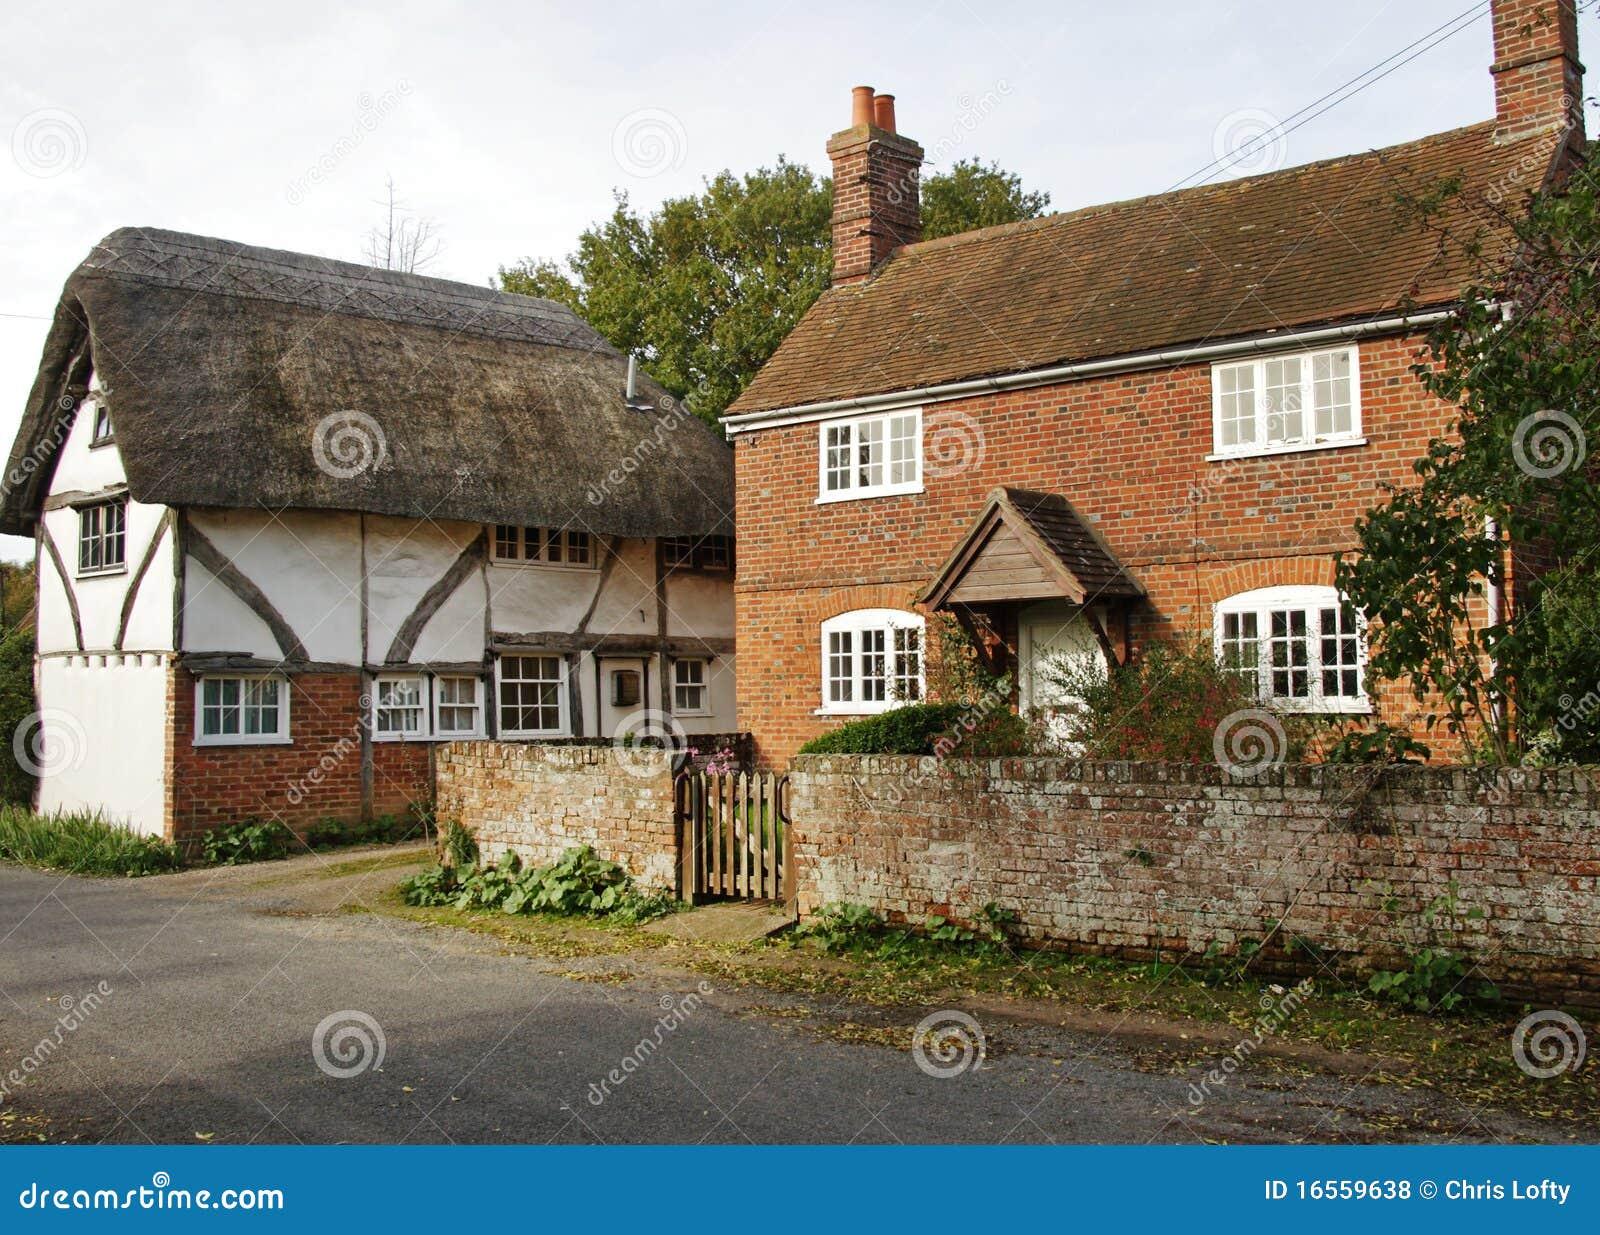 Casas de campo inglesas da vila da vila fotos de stock royalty free imagem 16559638 - Imagenes de casas inglesas ...